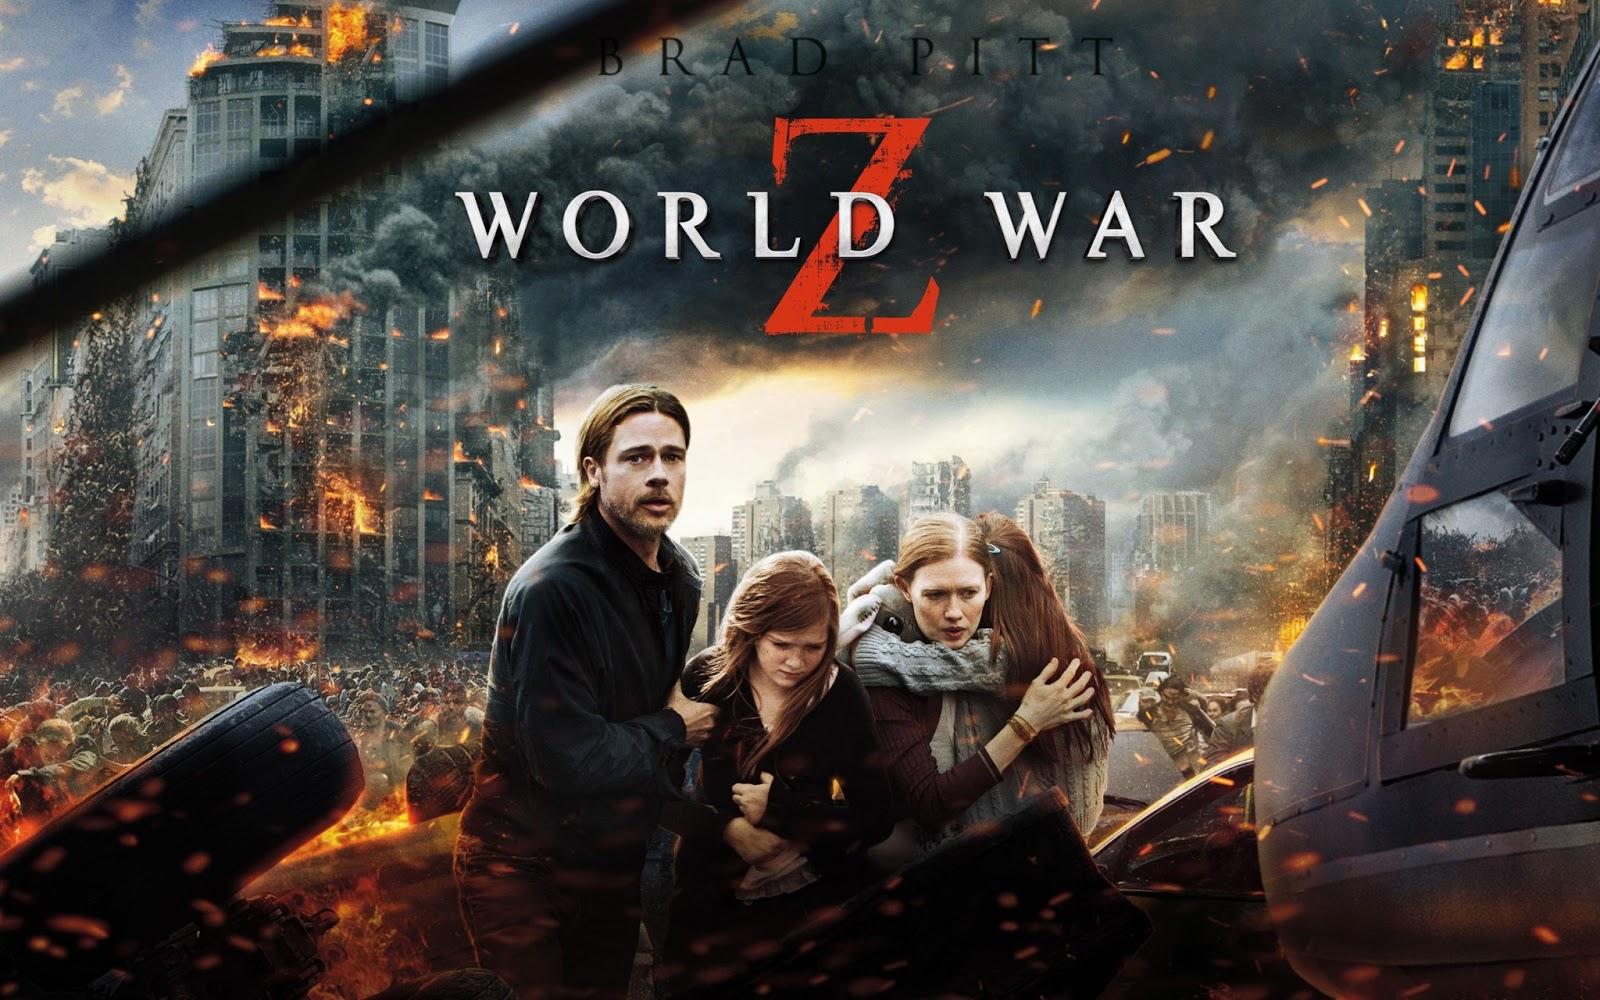 World War Z Pelicula Trailer